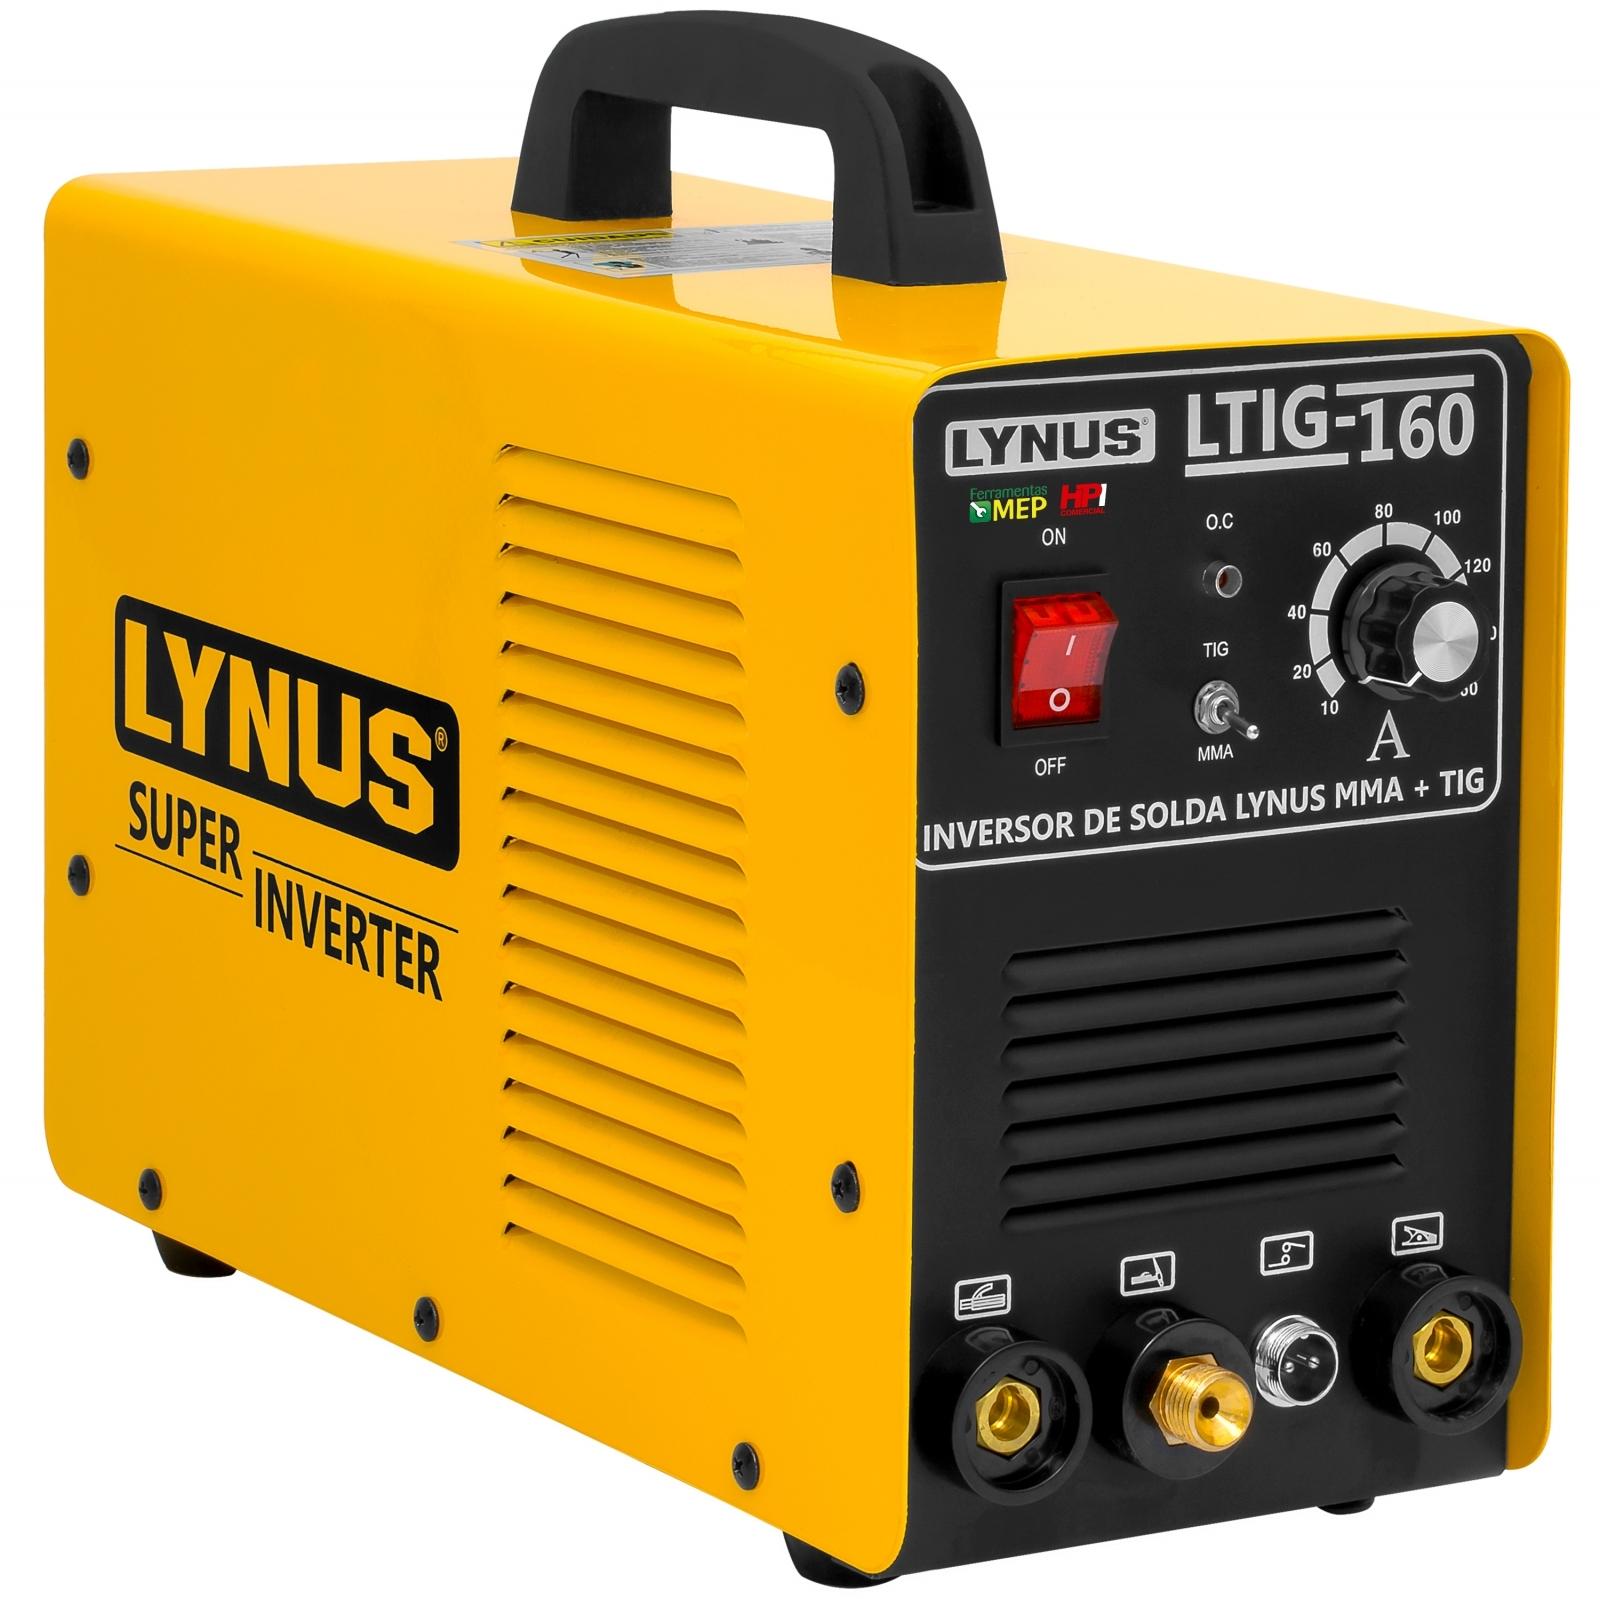 Máquina de Solda Tig Inox Ferro Eletrodo Inversora Lynus Com Tocha 160a - Ferramentas MEP